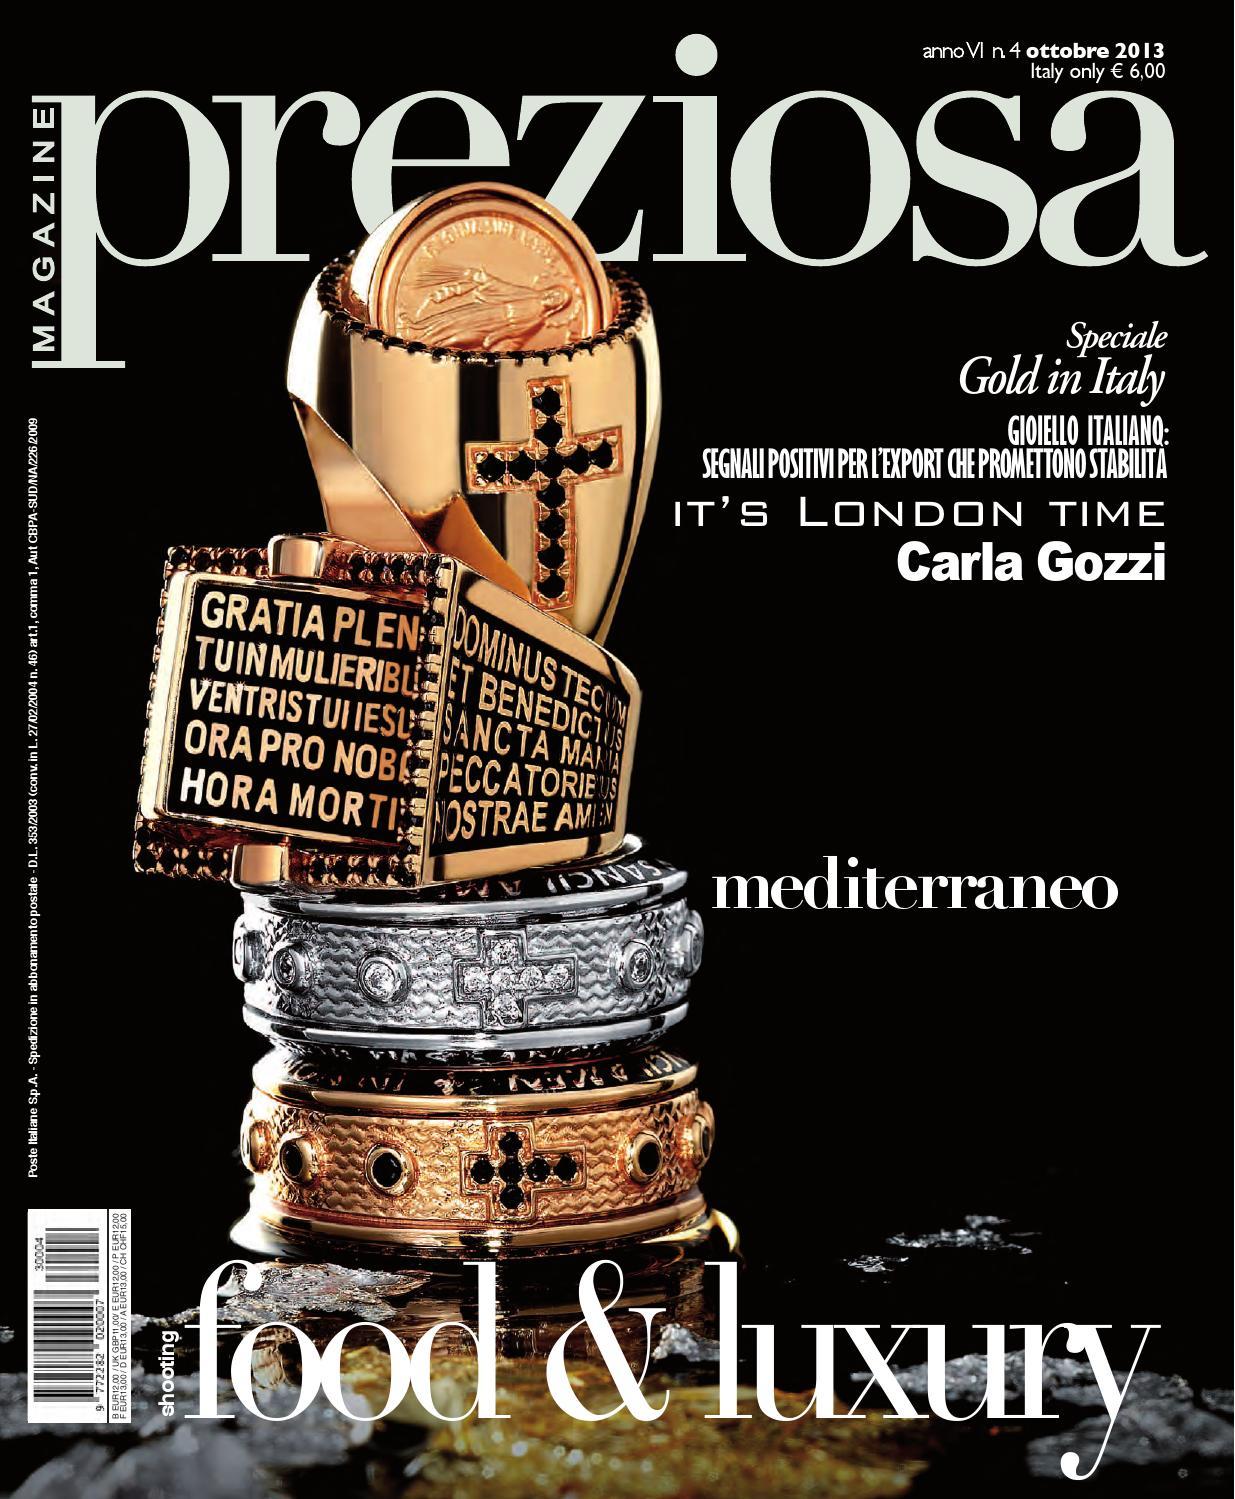 BRACCIALE INFINITO 8 ANCORA LOVE BIANCO AZZURRO DIRECTION INFINTY ANCHOR GOTHIC